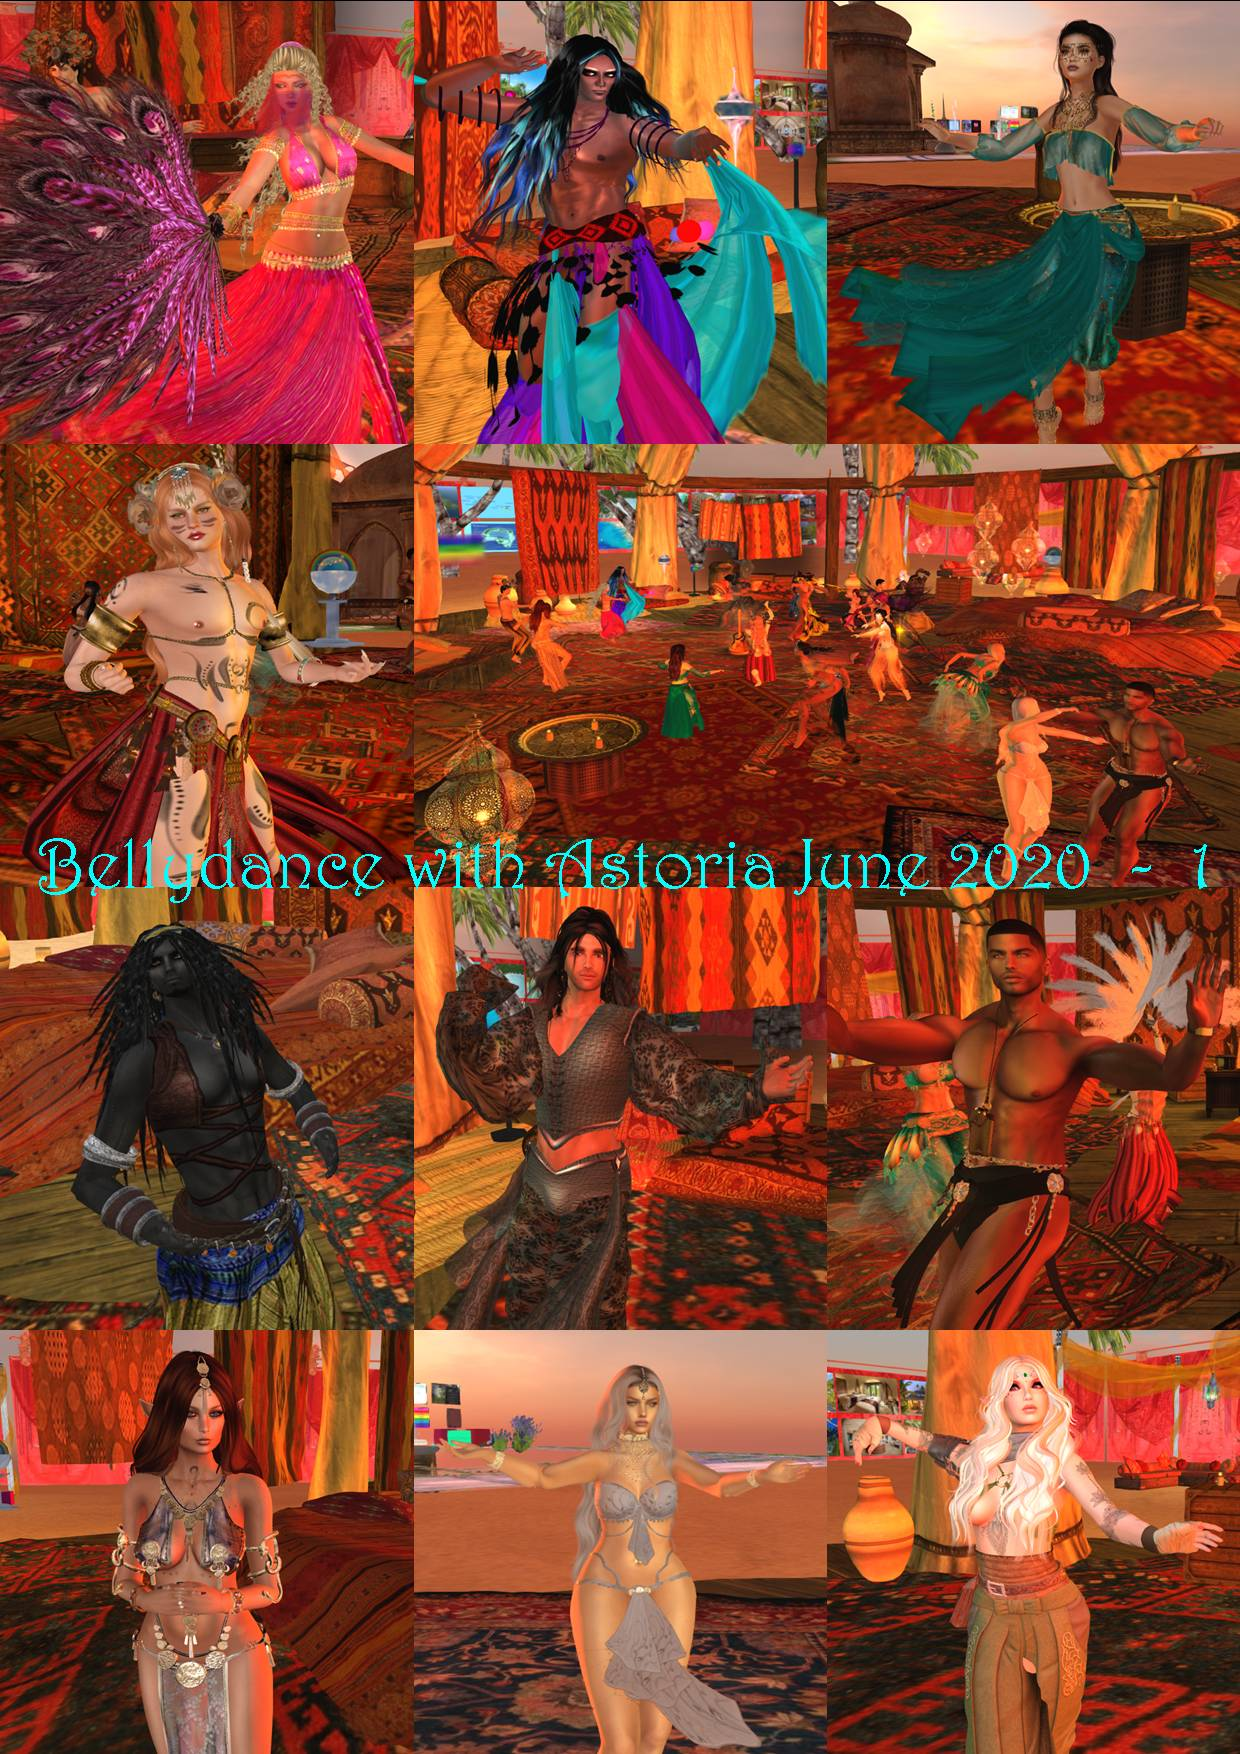 BELLYDANCE COLLAGE WITH ASTORIA JUNE 2020 - 1